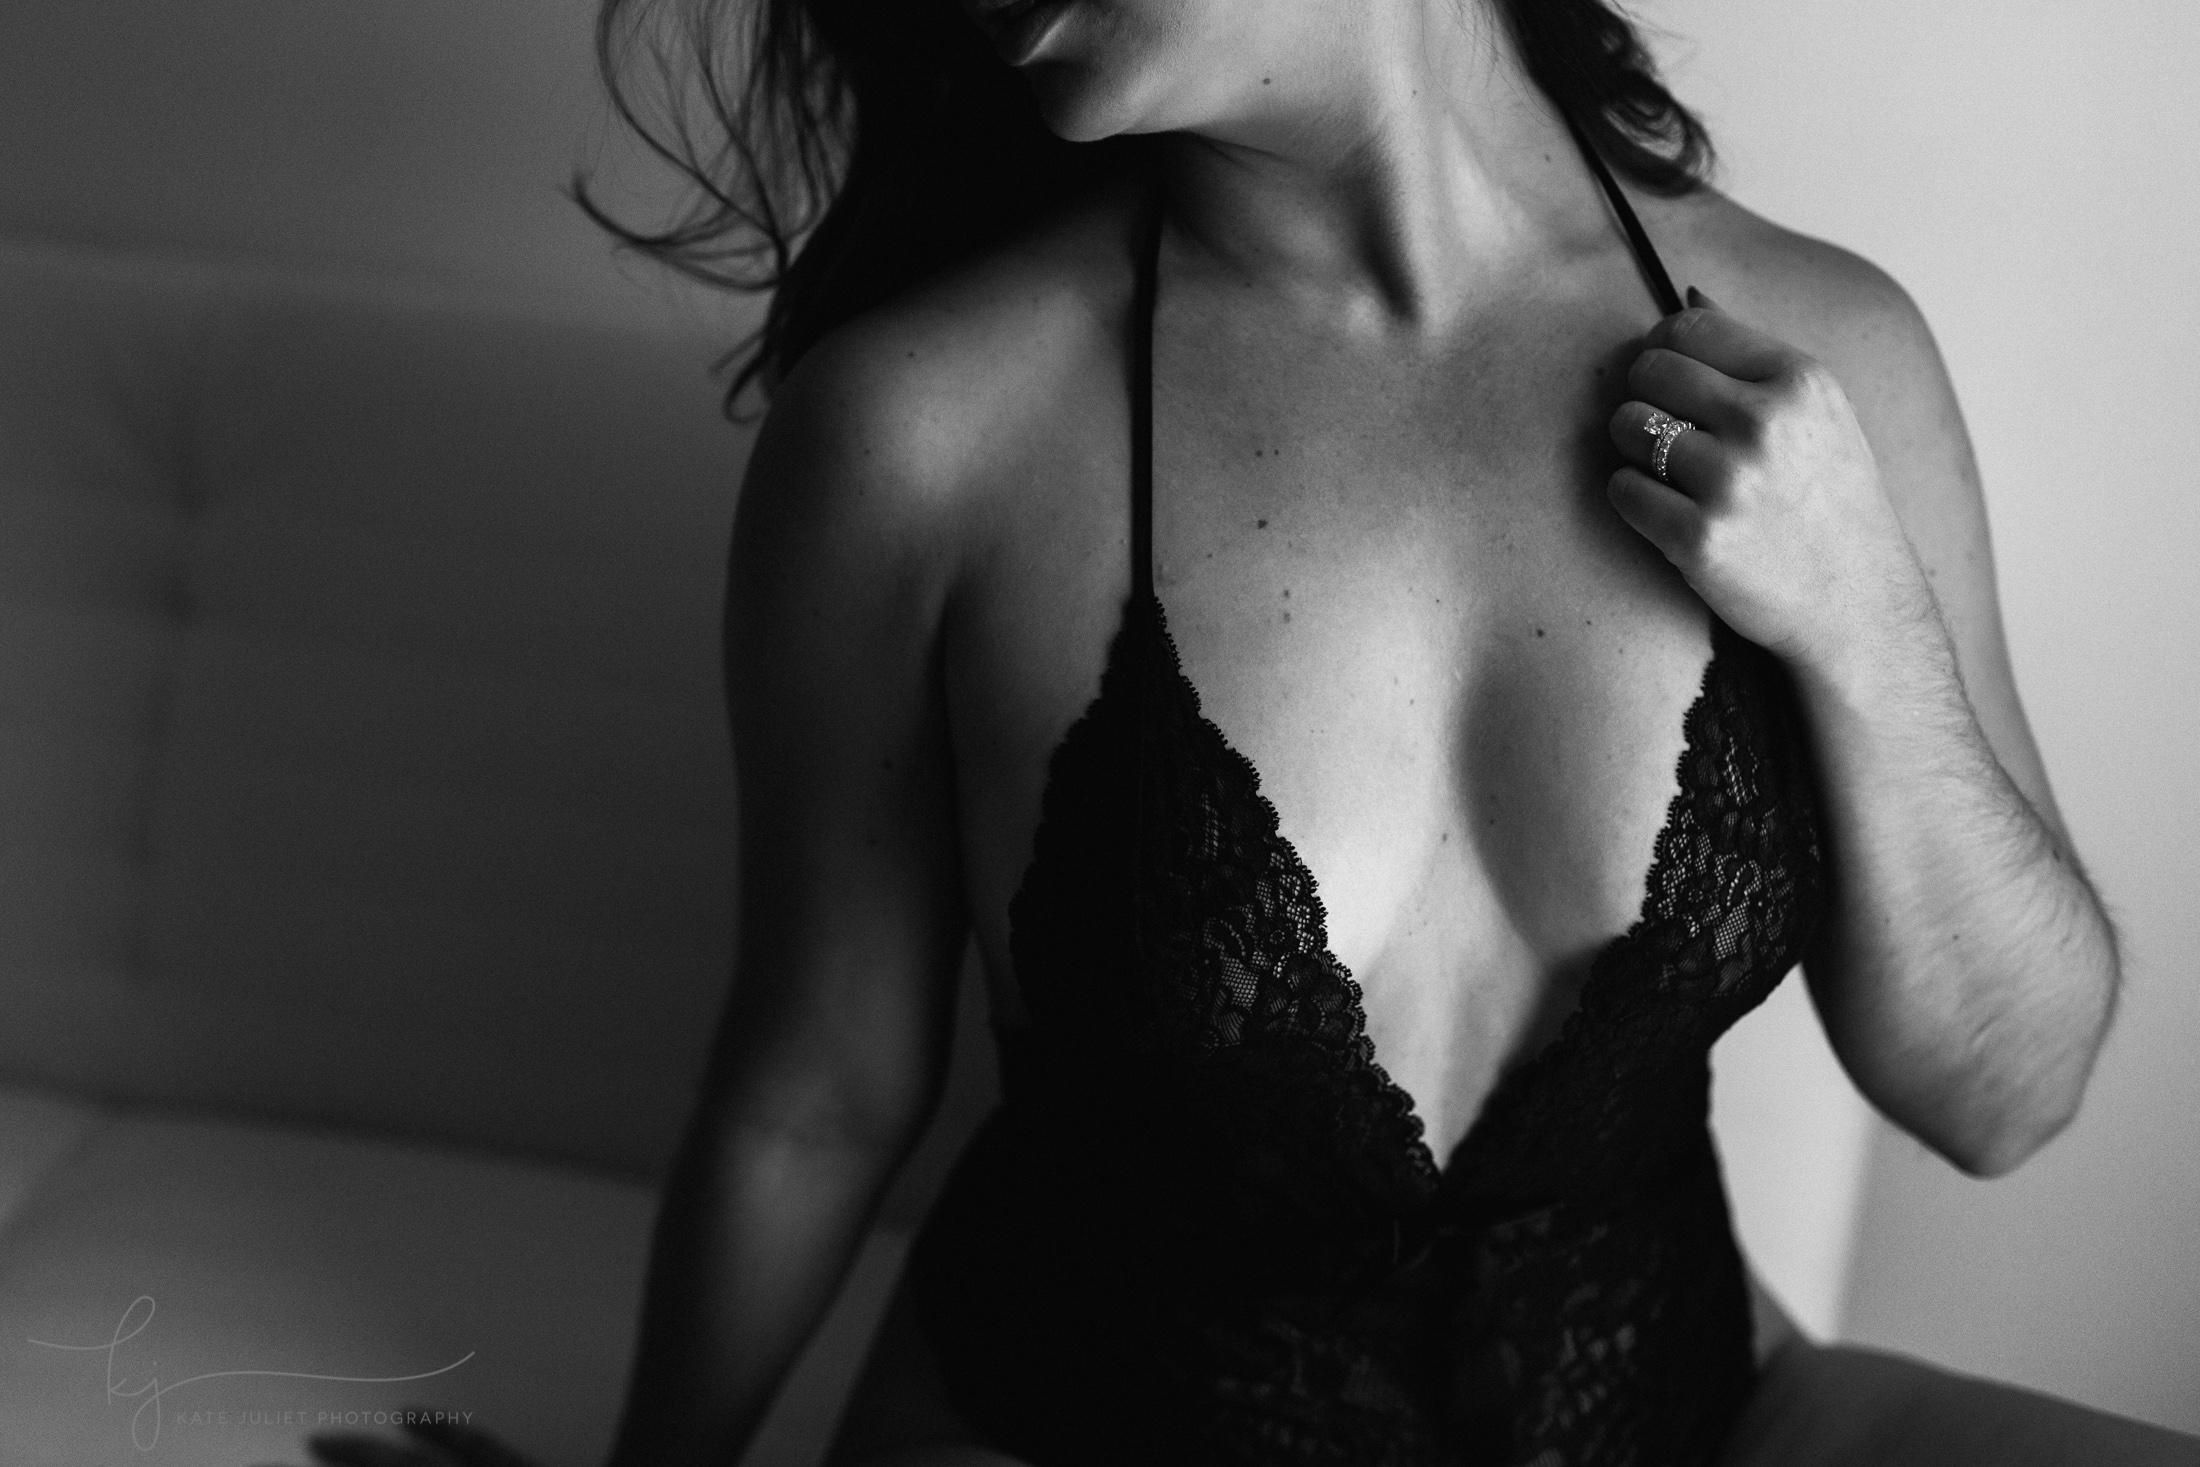 kate_juliet_photography_boudoir_arlington_va_web-54.jpg